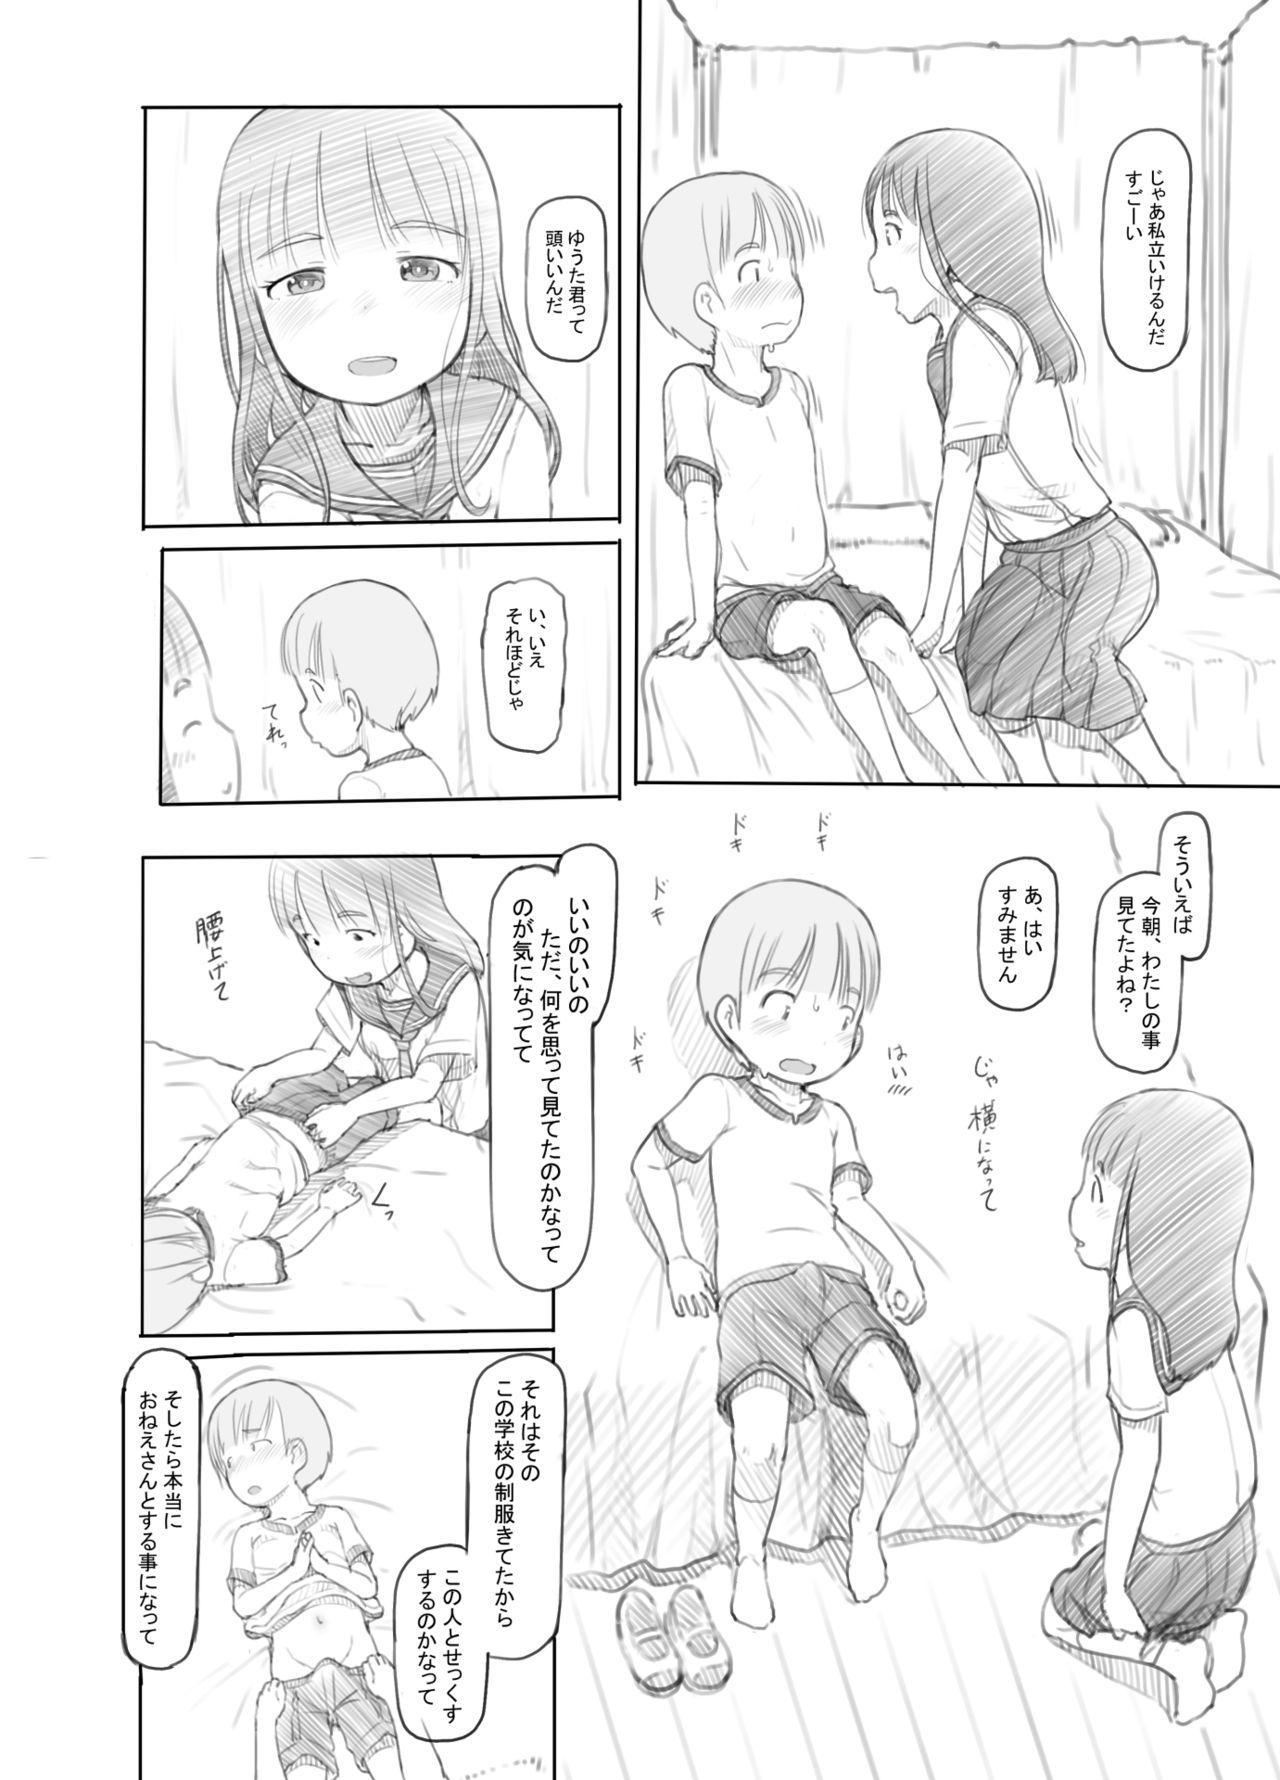 OneShota Sex Jisshuu 12